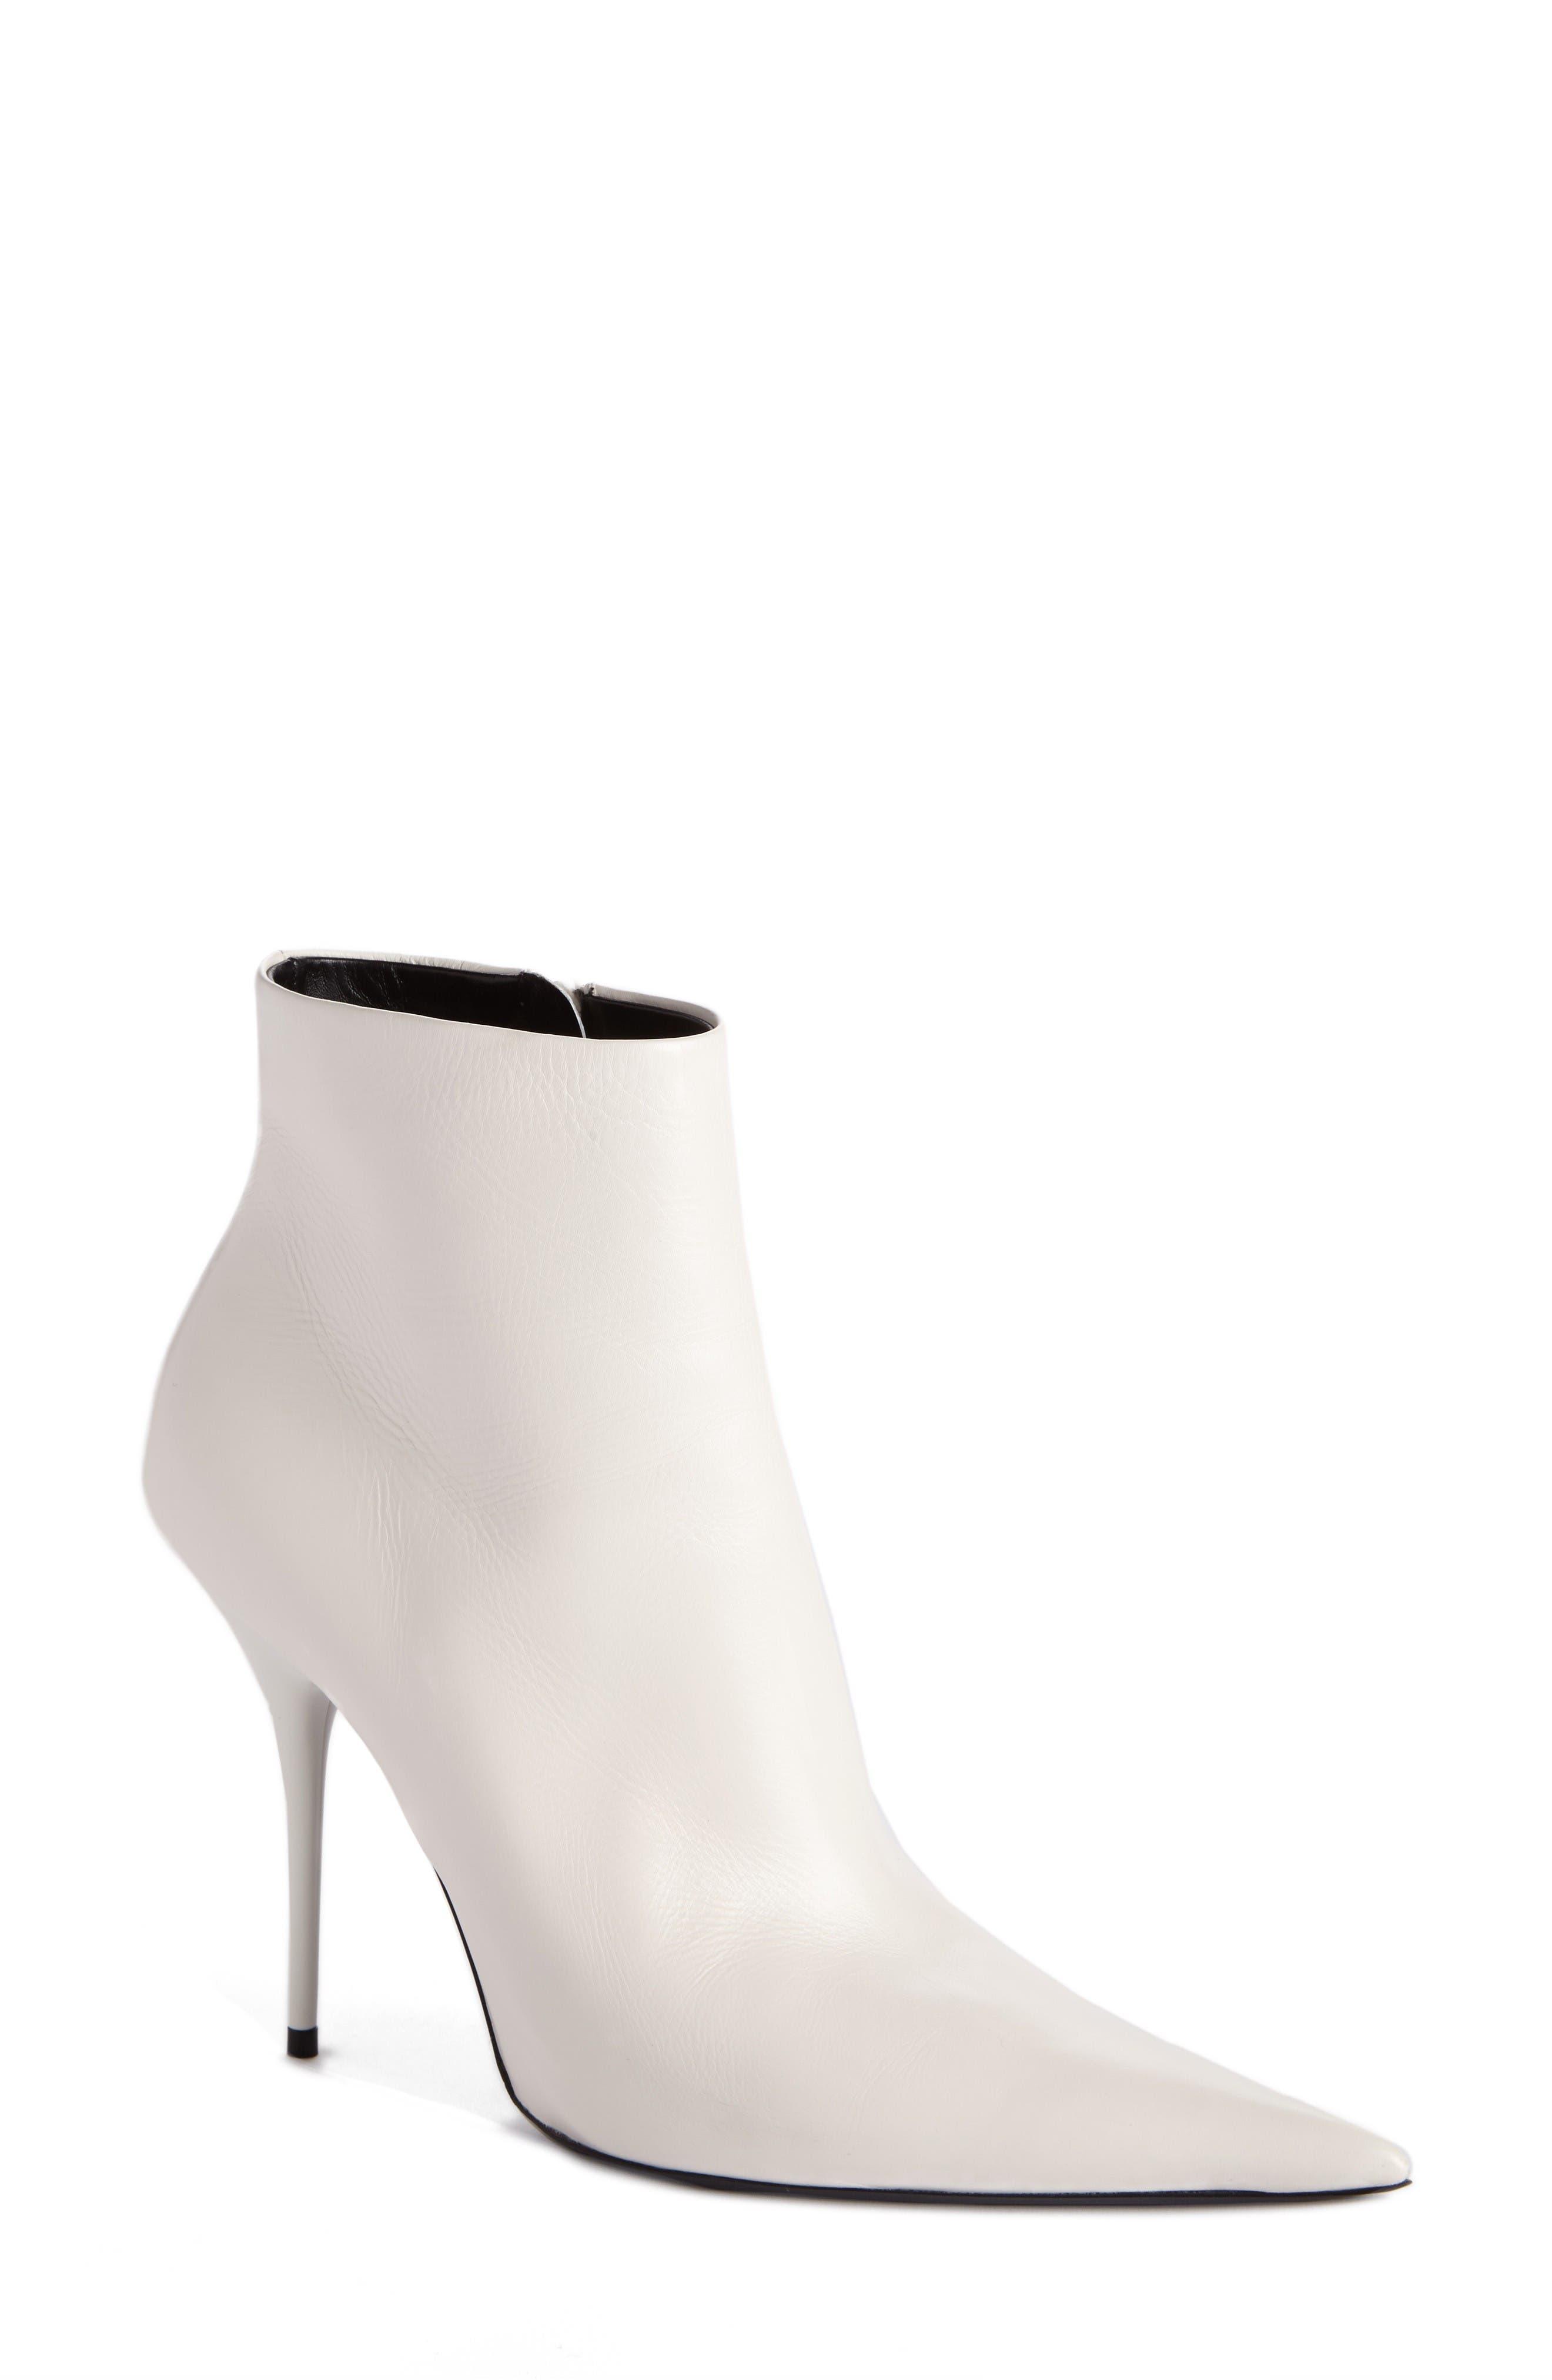 Main Image - Balenciaga Pointy Toe Bootie (Women)